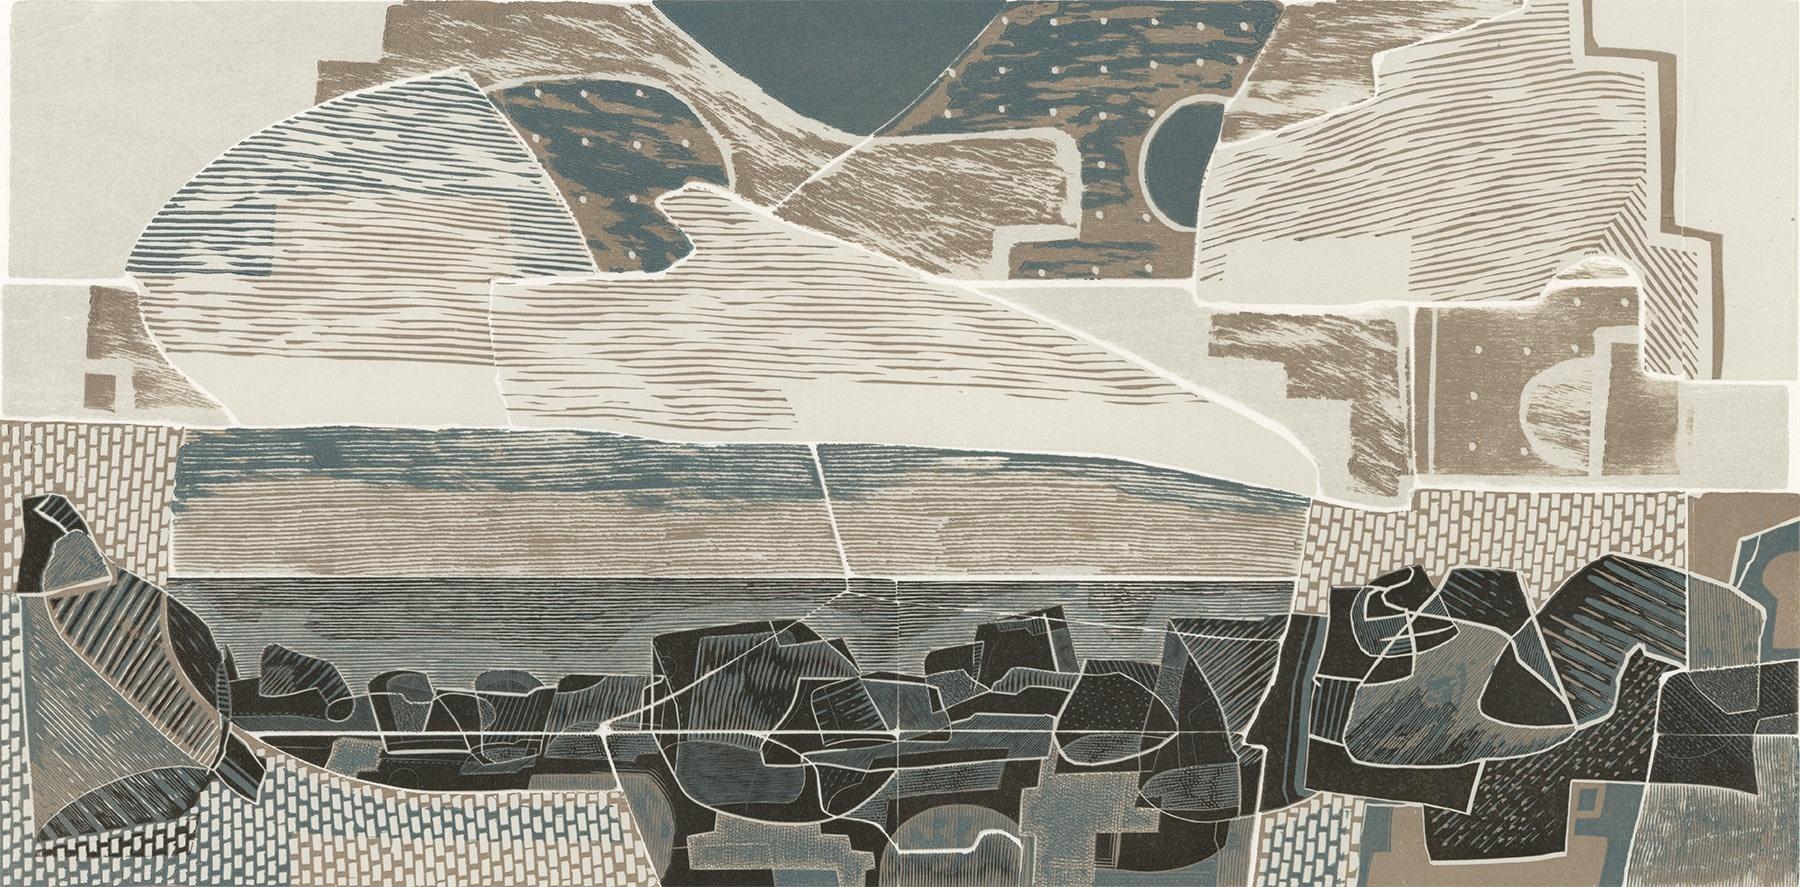 "<span class=""link fancybox-details-link""><a href=""/exhibitions/18/works/image_standalone967/"">View Detail Page</a></span><p>Neil Bousfield RE</p><p>Land & Sea, Past & Present 1</p><p>linocut, woodcut & engraving</p><p>37 x 52cm</p><p>£550 framed</p><p>£450 unframed</p>"